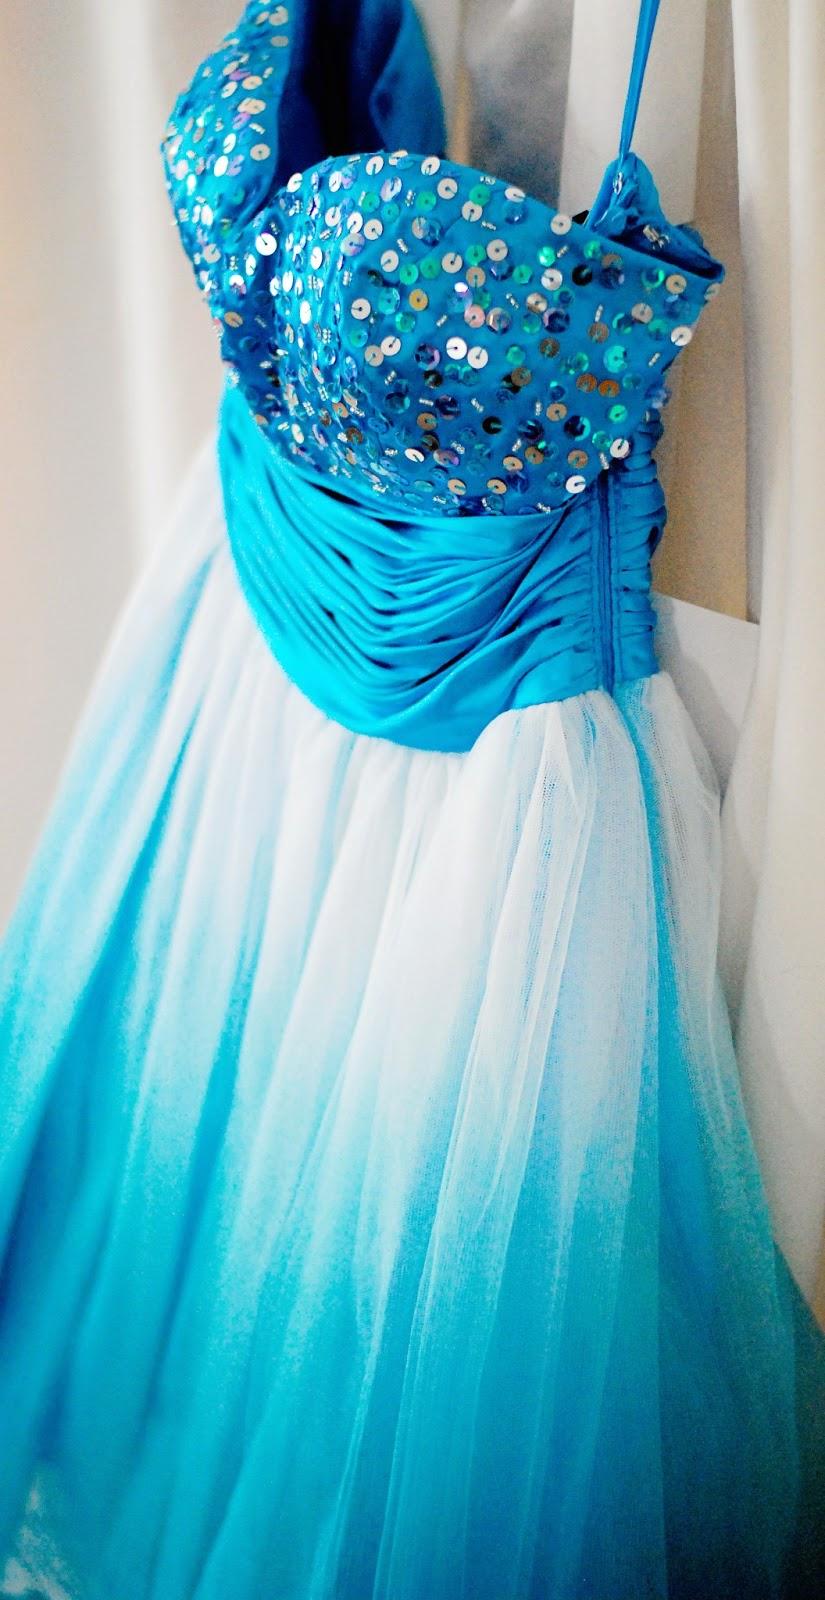 vaughan mills prom dresses,Prom Dress at Target,Prom Dresses at Target,